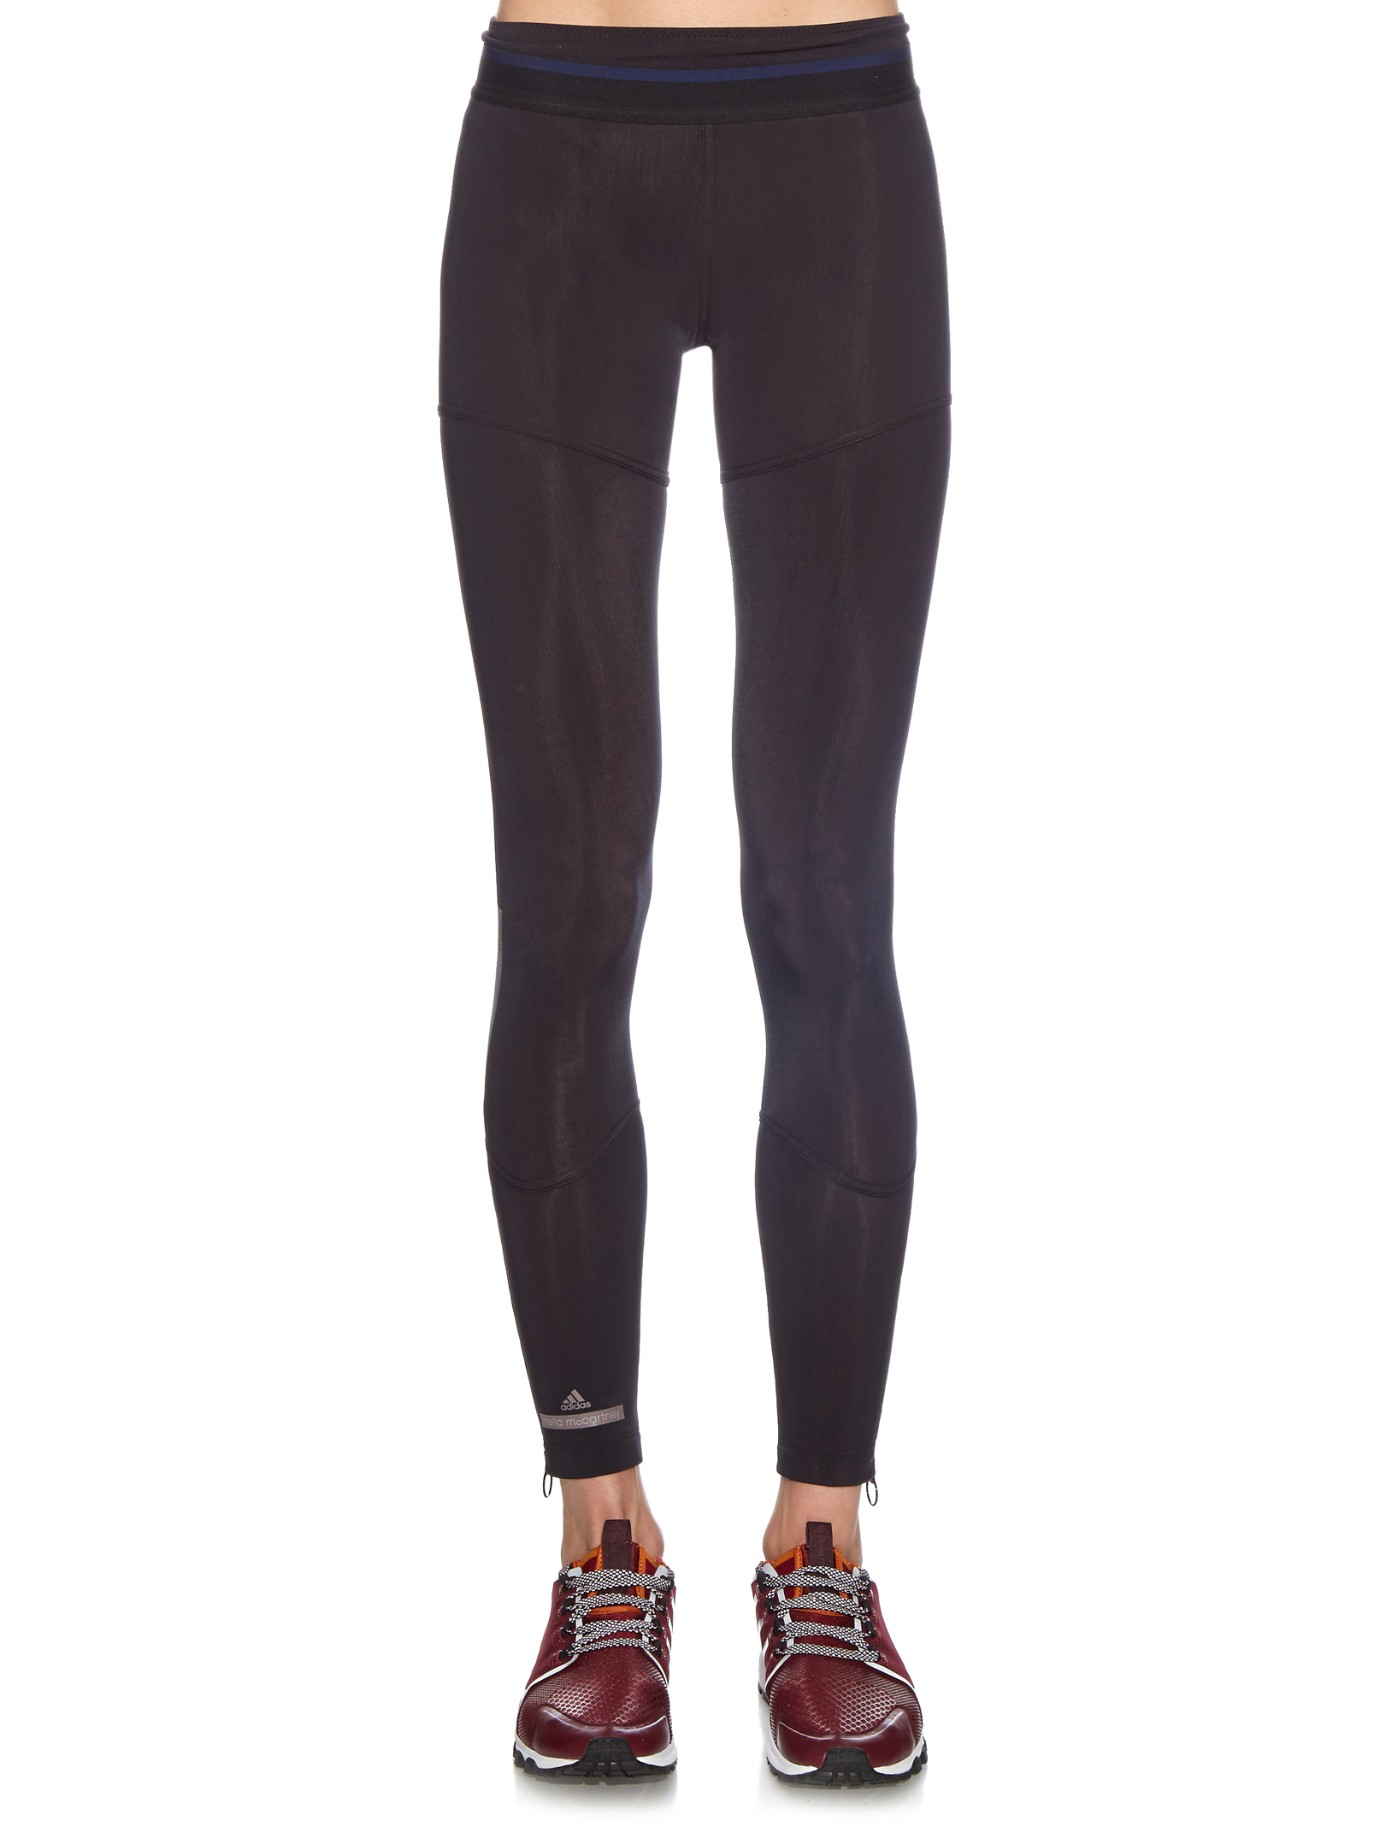 adidas by stella mccartney slim running performance leggings in black lyst. Black Bedroom Furniture Sets. Home Design Ideas